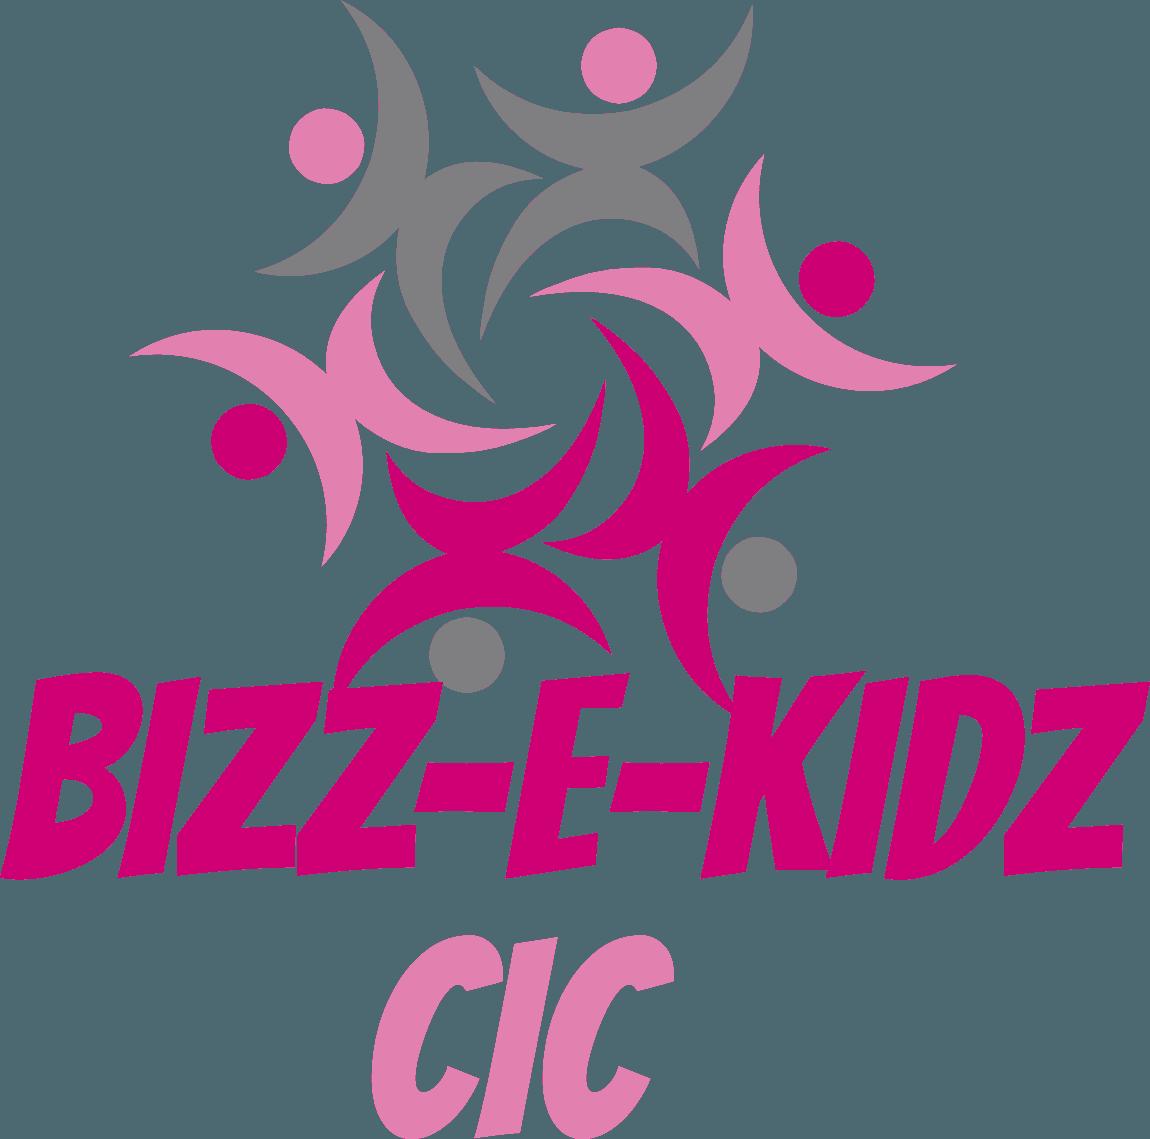 Bizz-E-Kidz CIC Logo